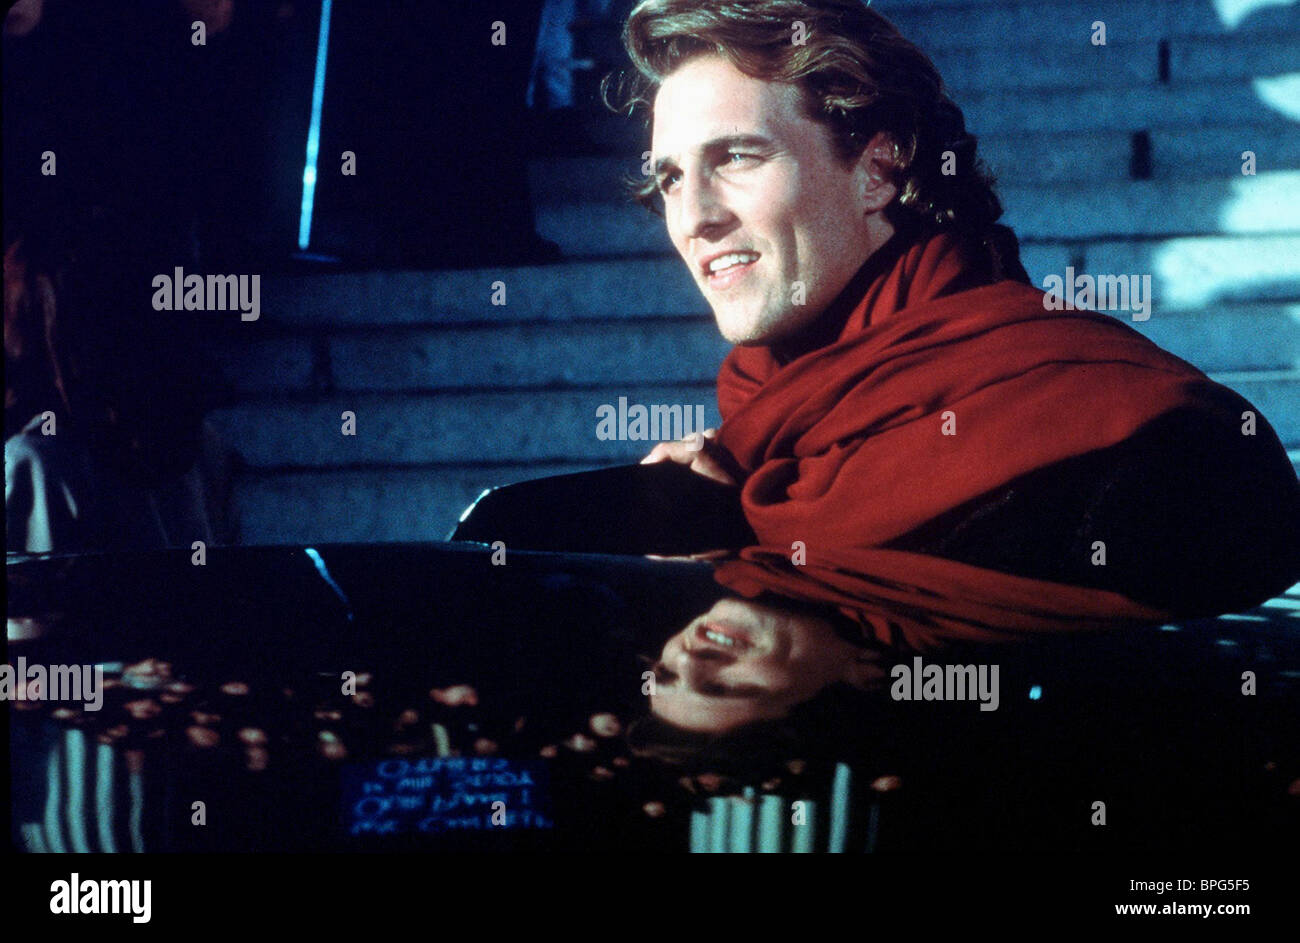 Matthew Mcconaughey Contact 1997 Stock Photo Alamy